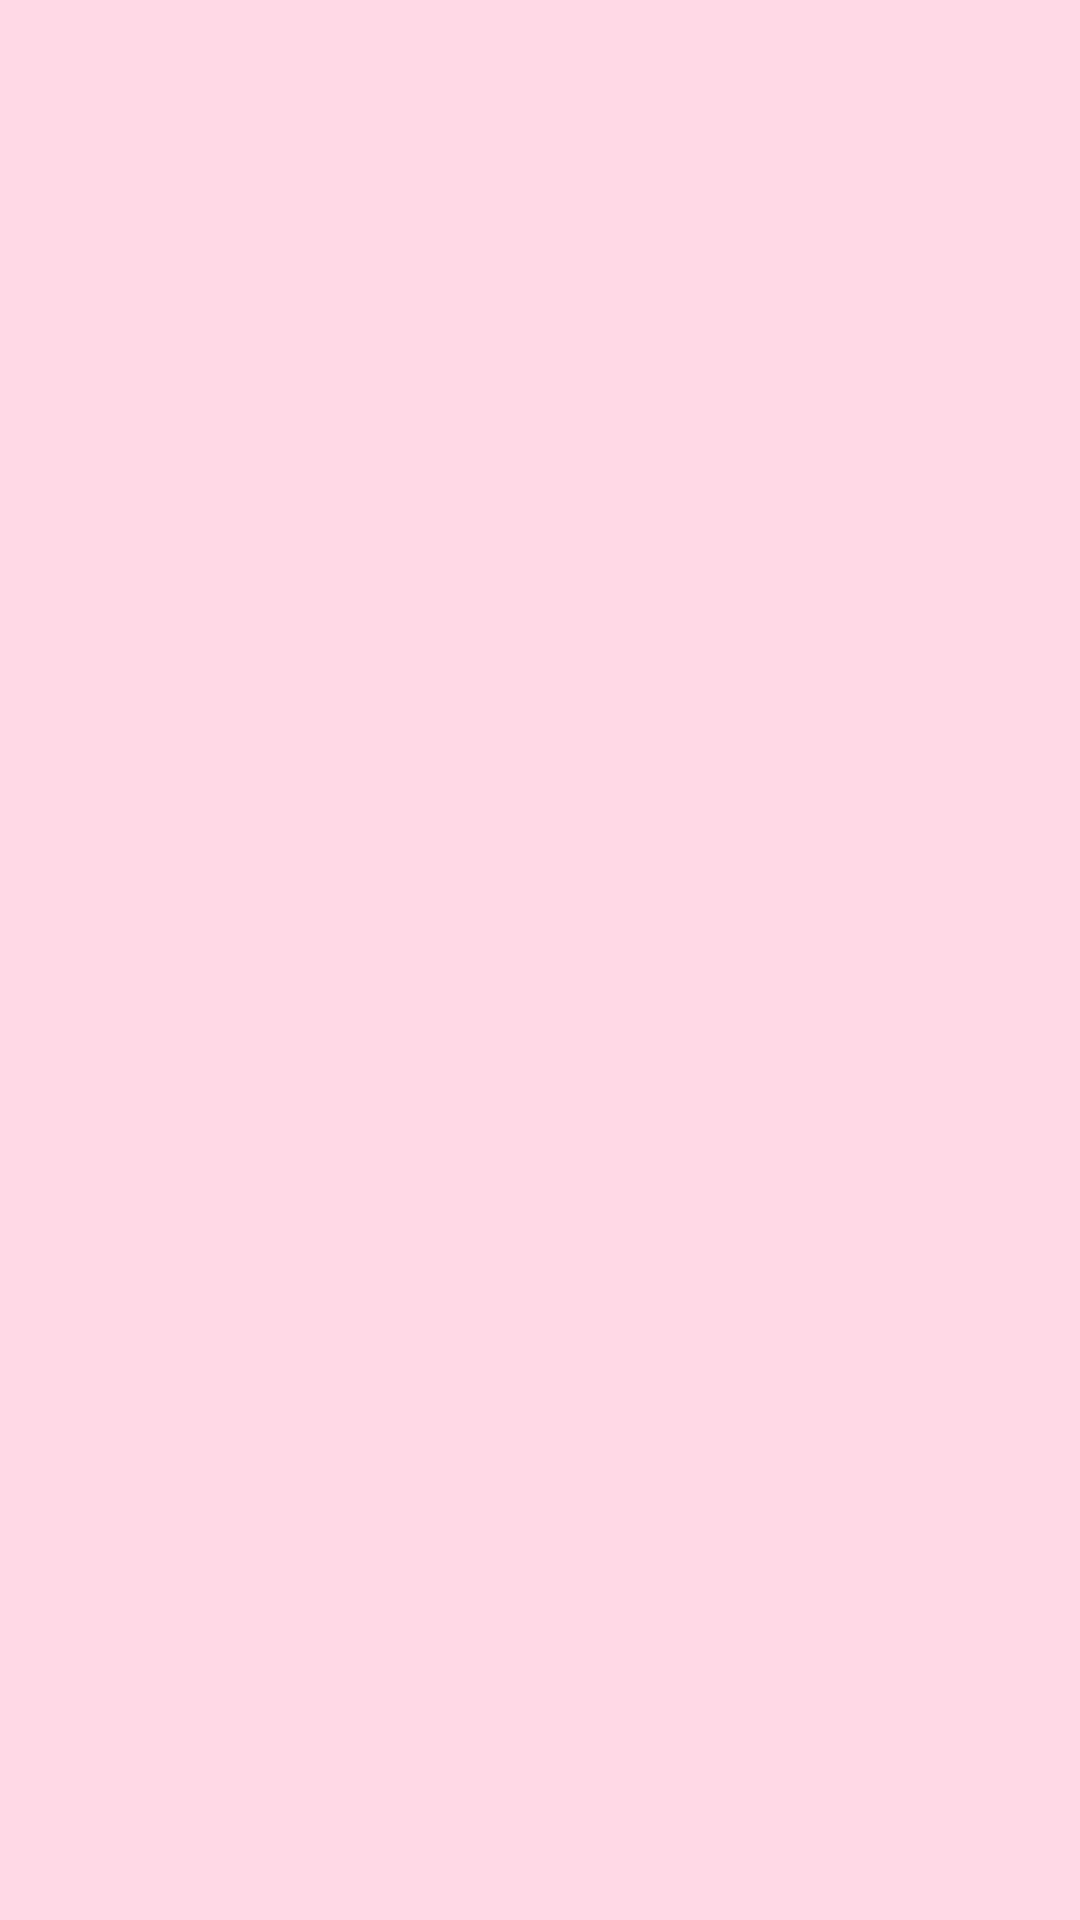 Plain baby pink wallpaper